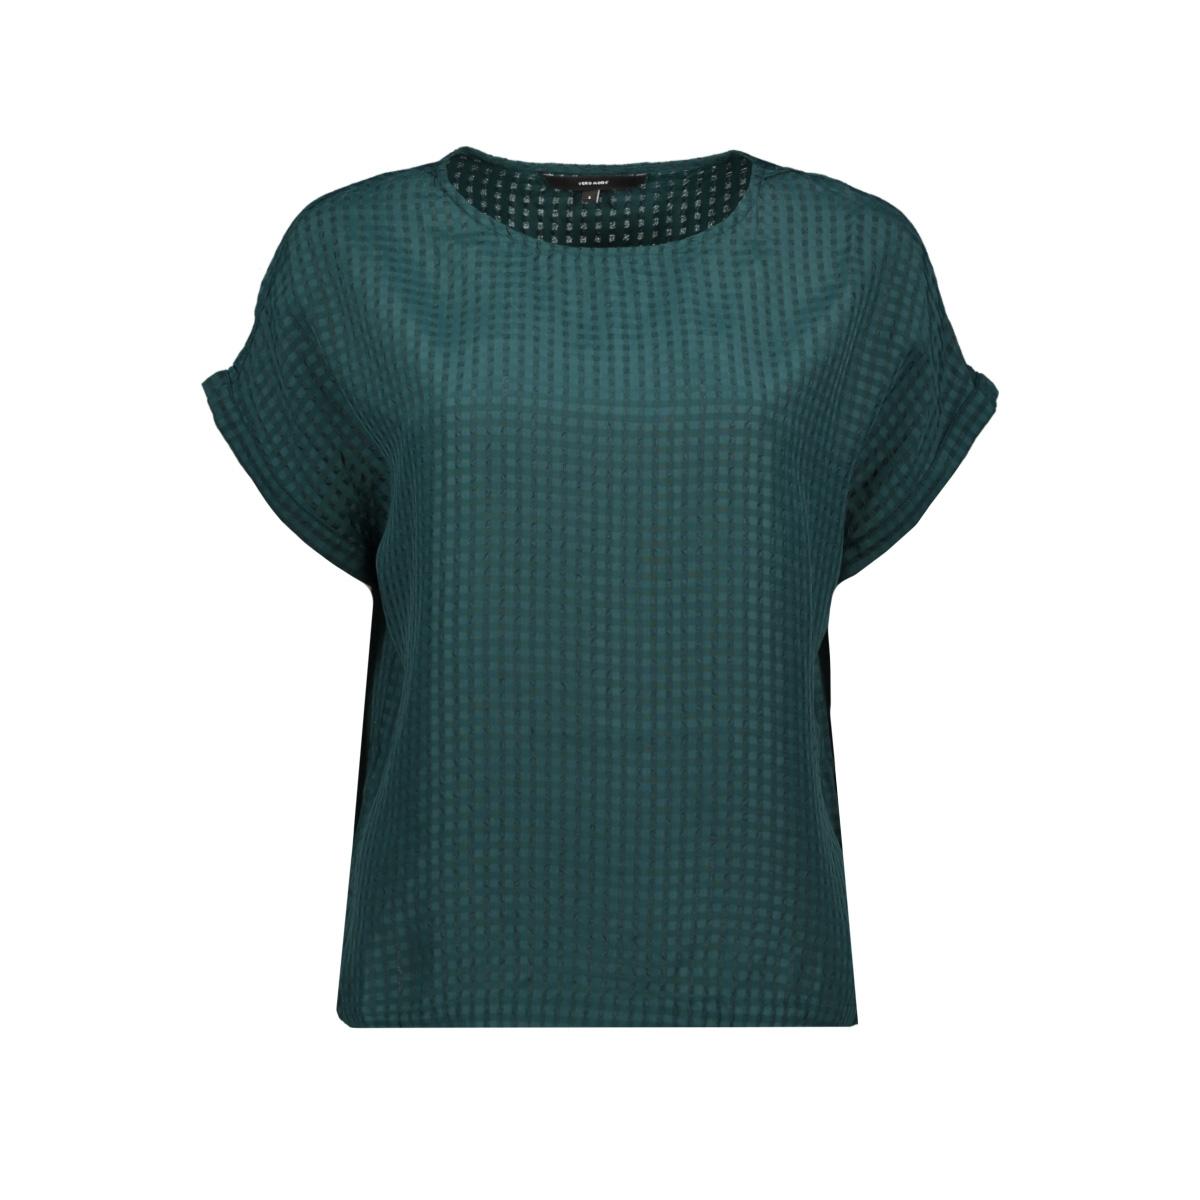 vmbeate s/s top wvn 10217677 vero moda t-shirt ponderosa pine